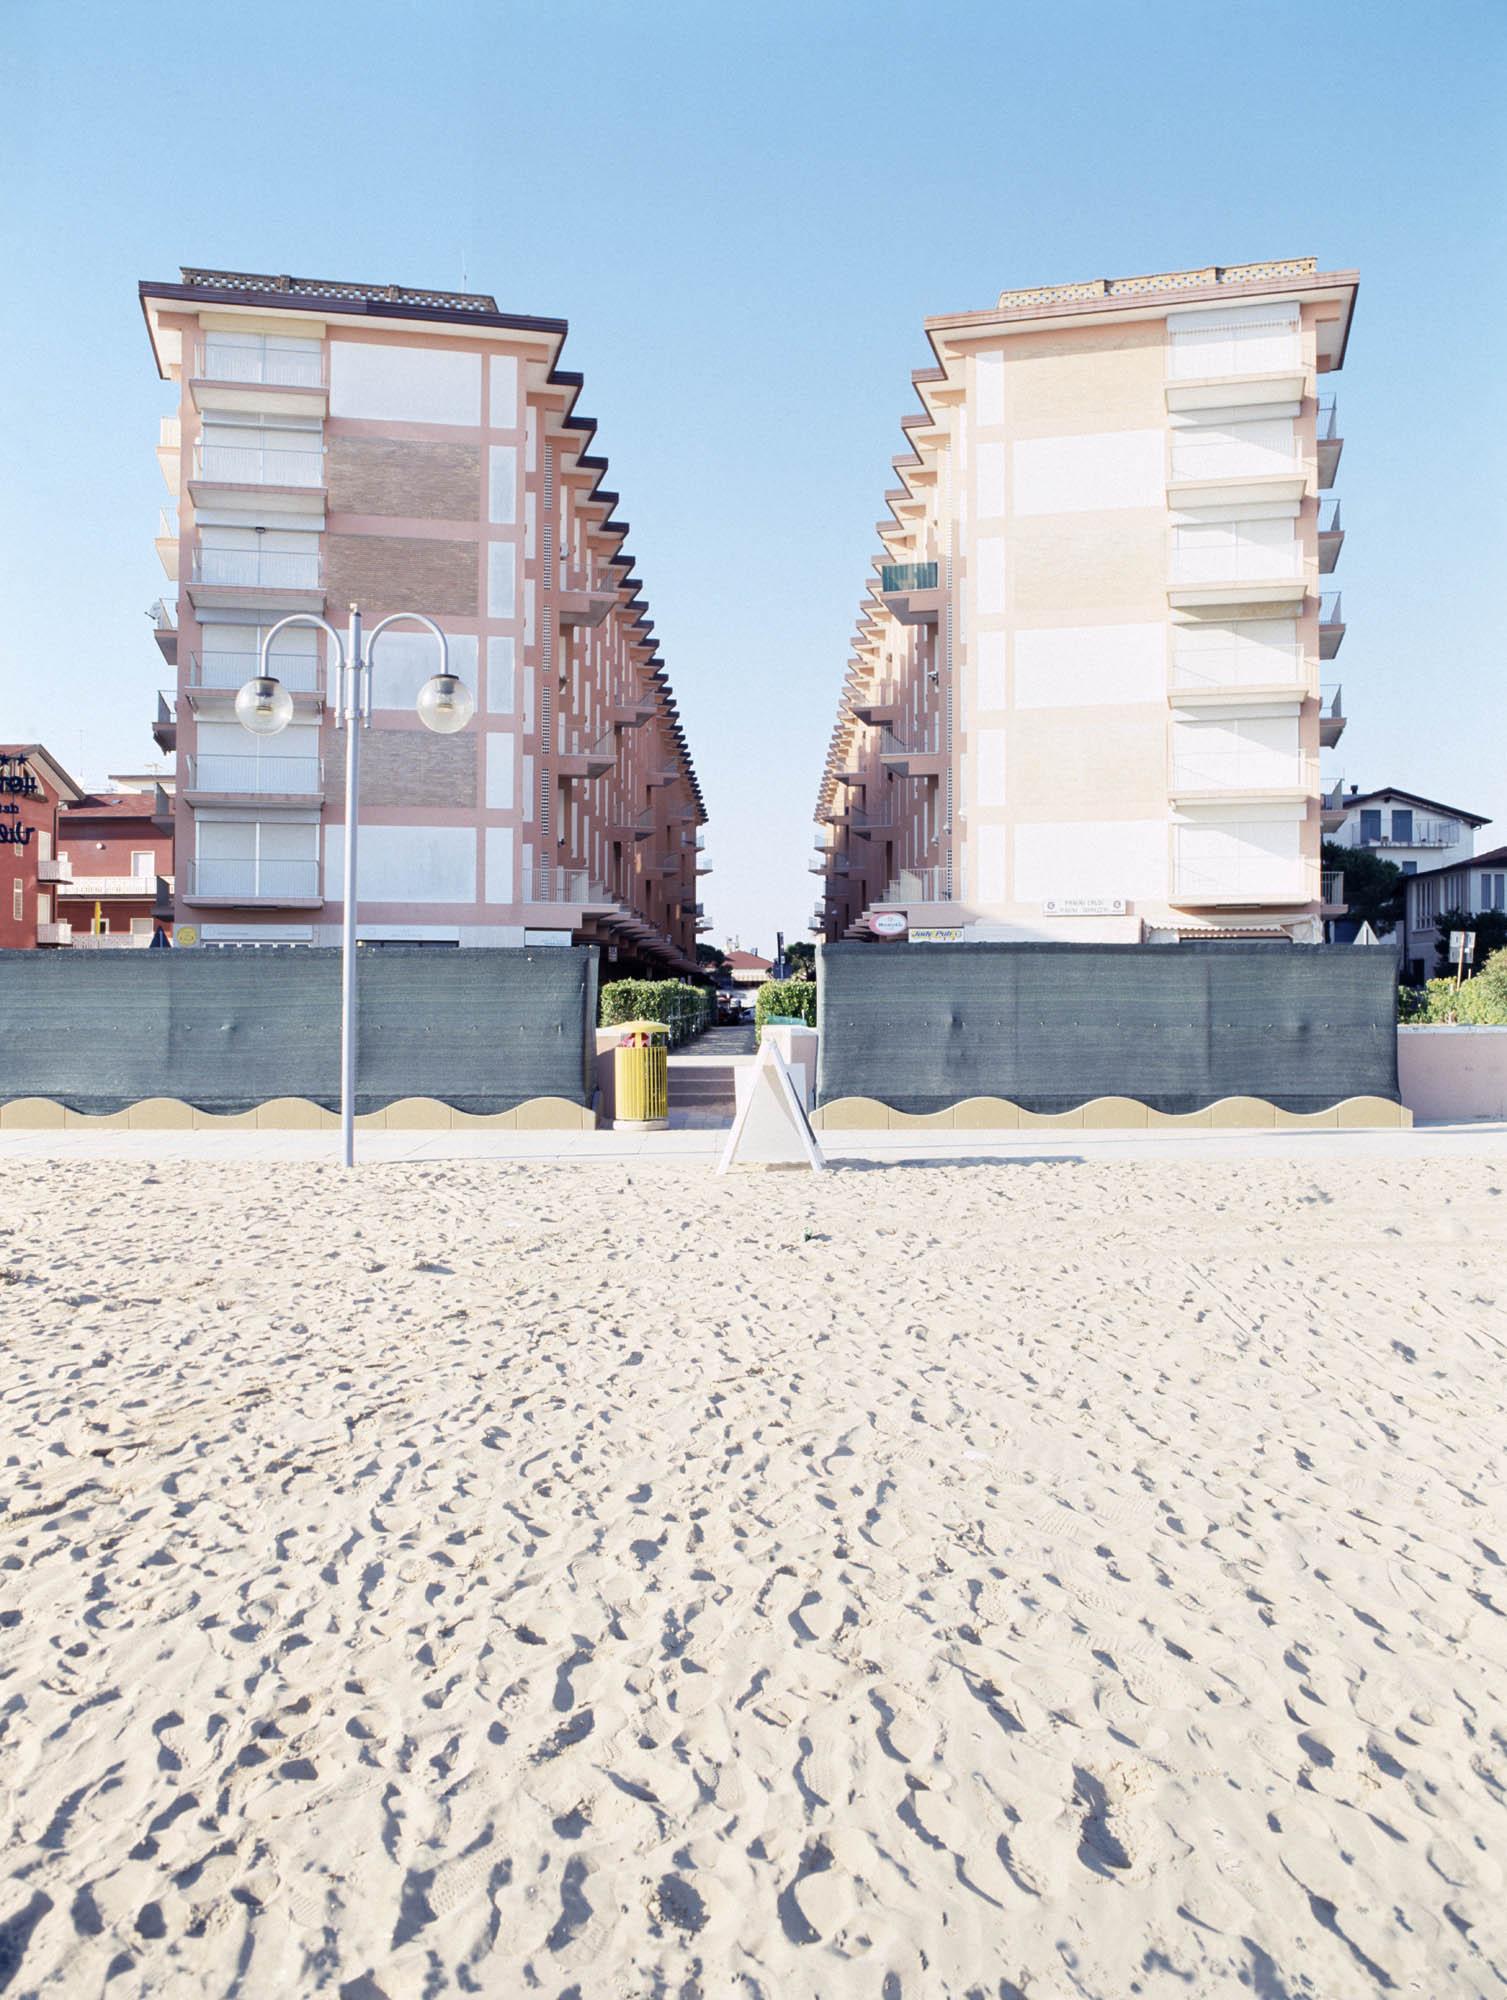 'Twin Buildings, Jesolo', Archival pigment print